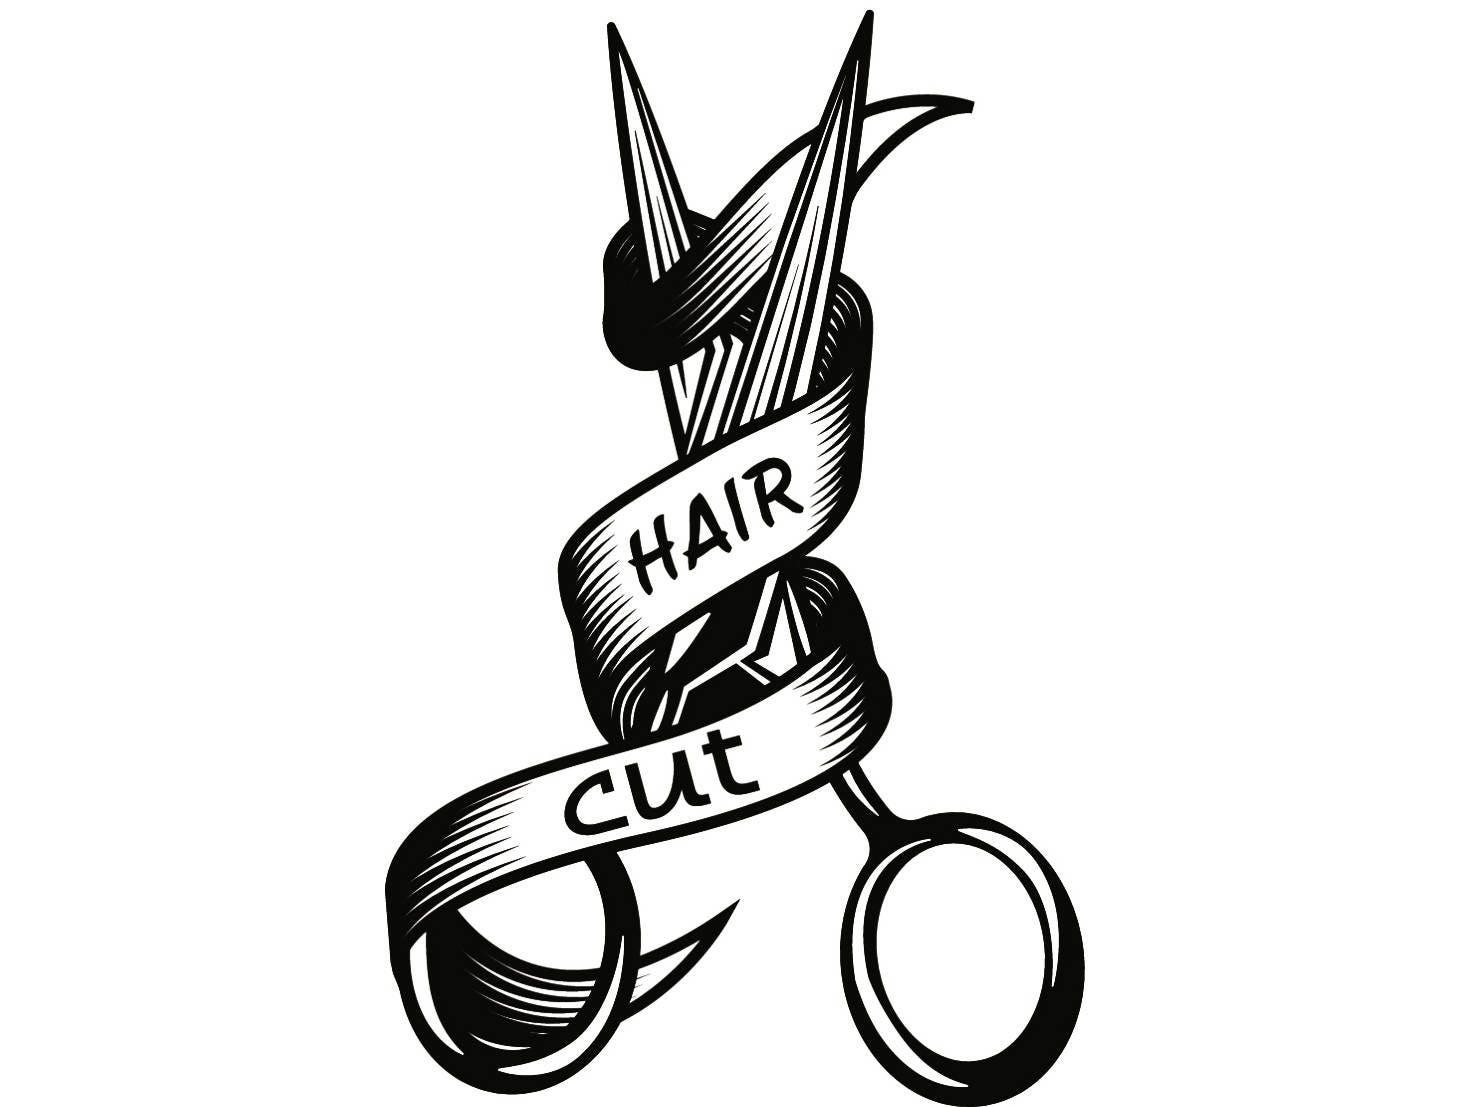 Hairstylist Logo 3 Scissors Salon Barber Shop Haircut